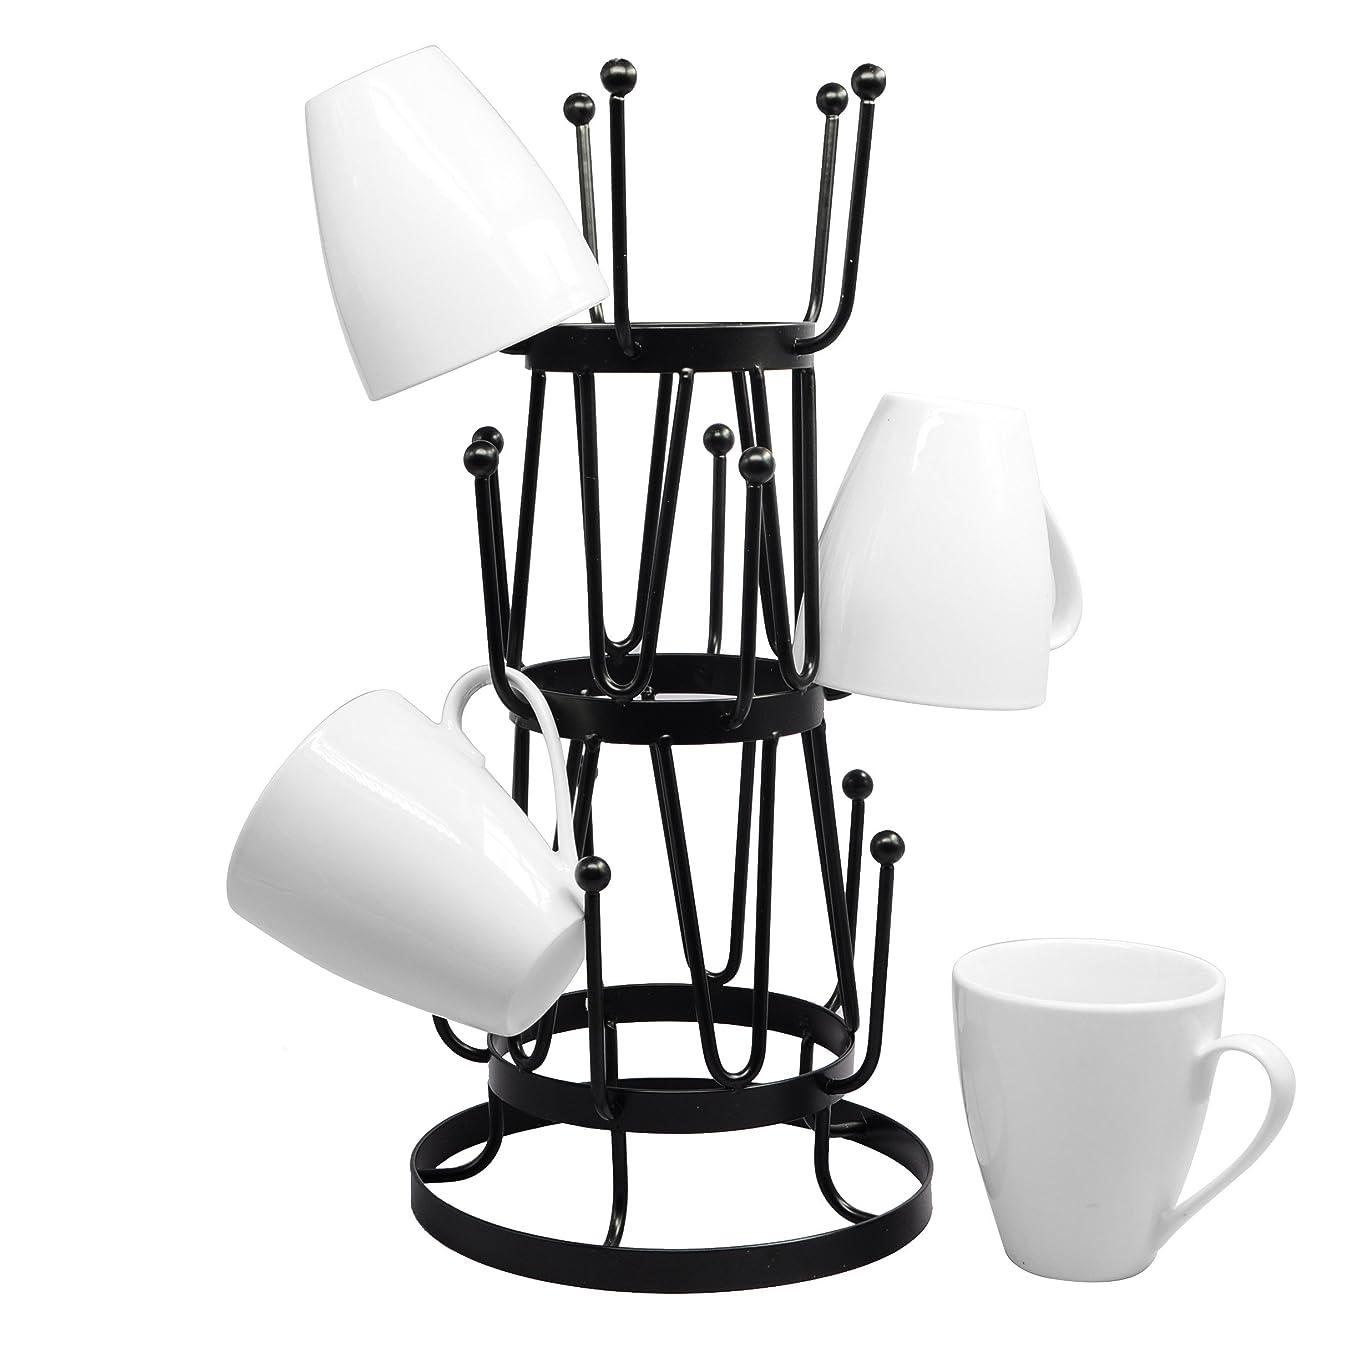 Stylish Steel Mug Tree Holder Organizer Rack Stand (Black)